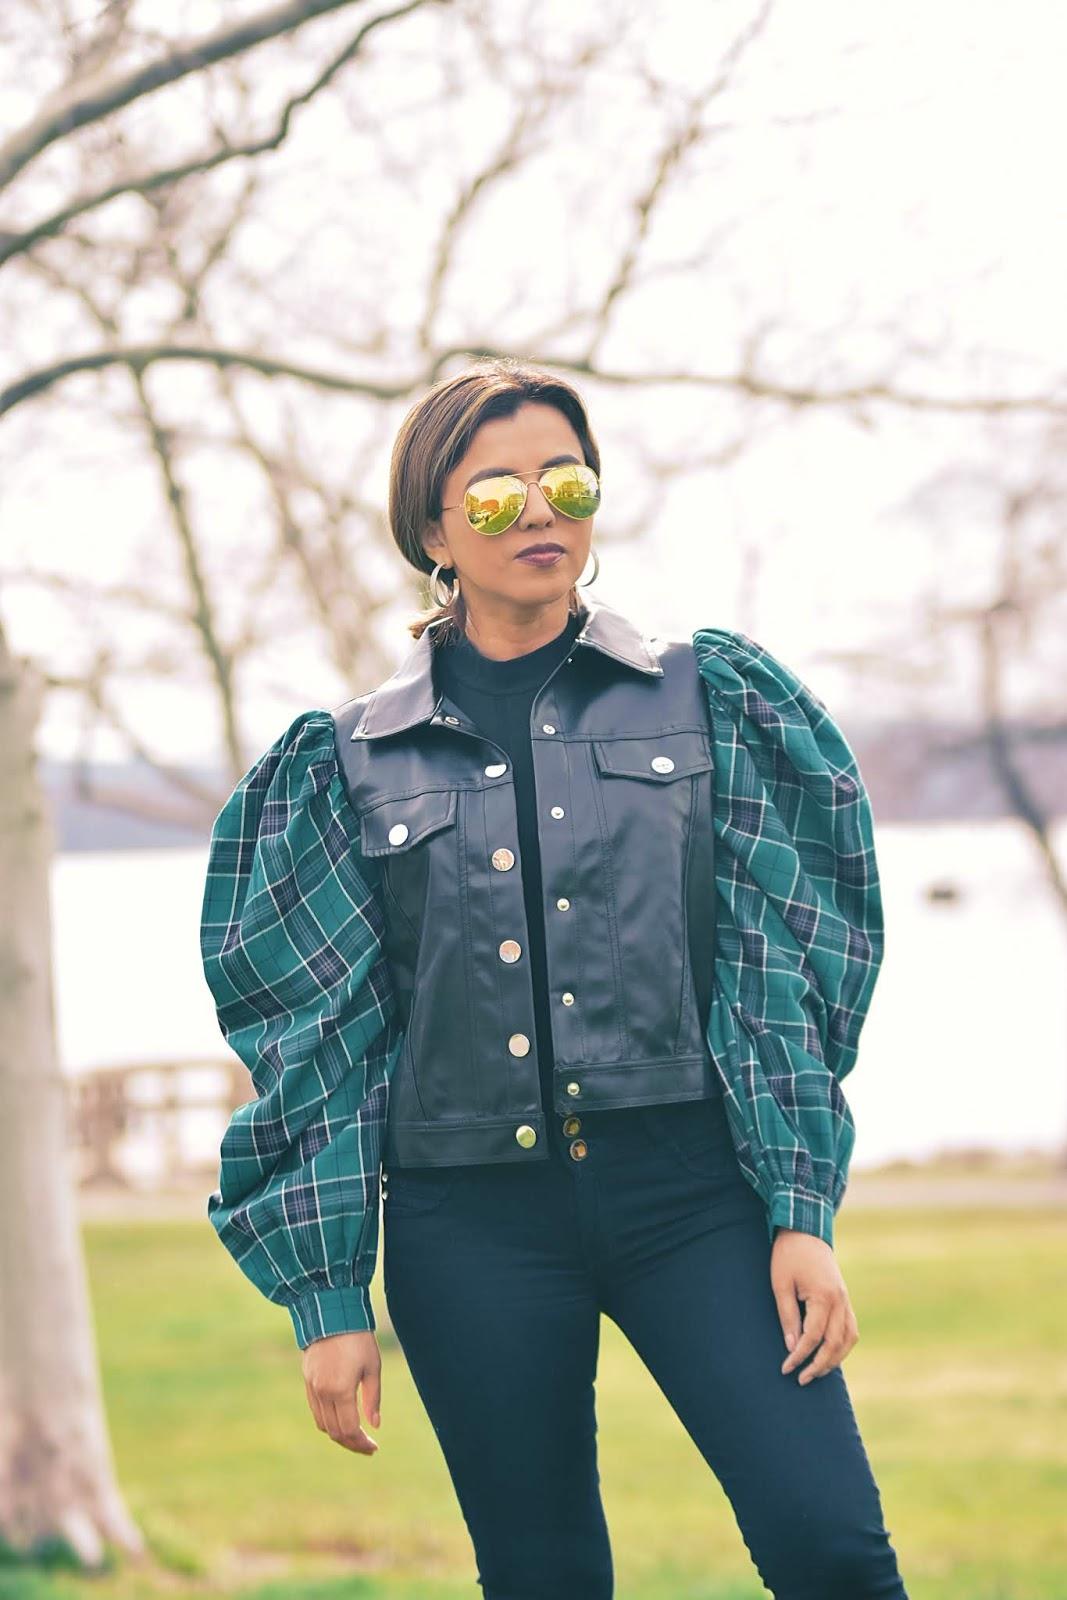 Biker Jacket Con Mangas Abullonadas by Mari Estilo-sheingals-dcblogger-travelblogger-traveller-placestogo-modaelsalvador-tendencias primavera verano2020-